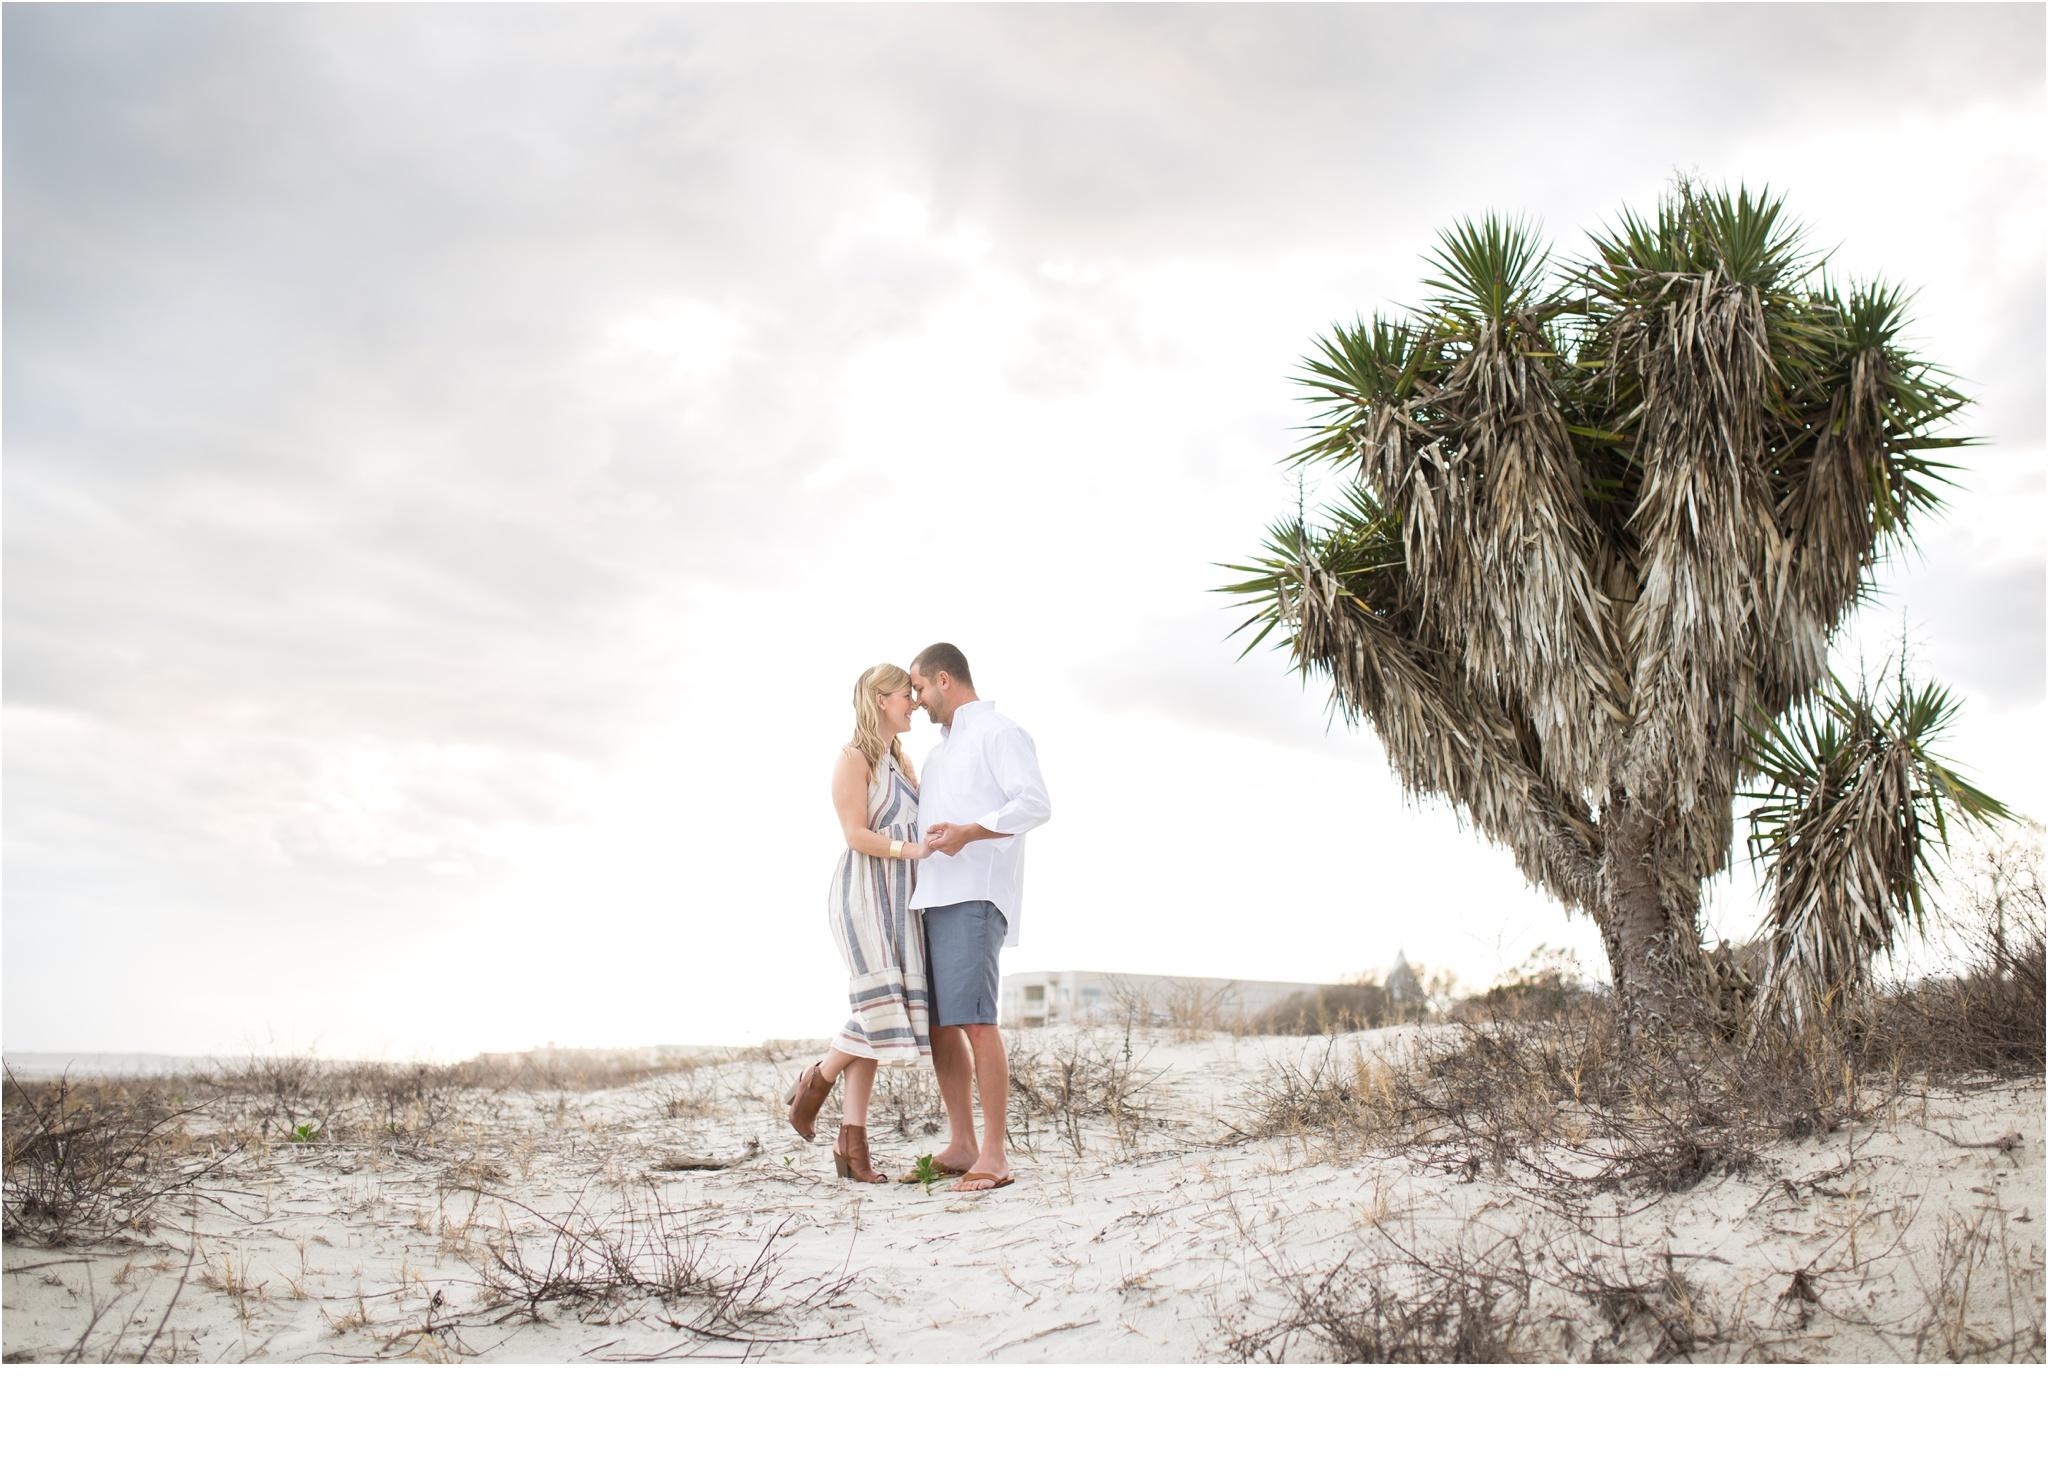 Rainey_Gregg_Photography_St._Simons_Island_Georgia_California_Wedding_Portrait_Photography_0554.jpg